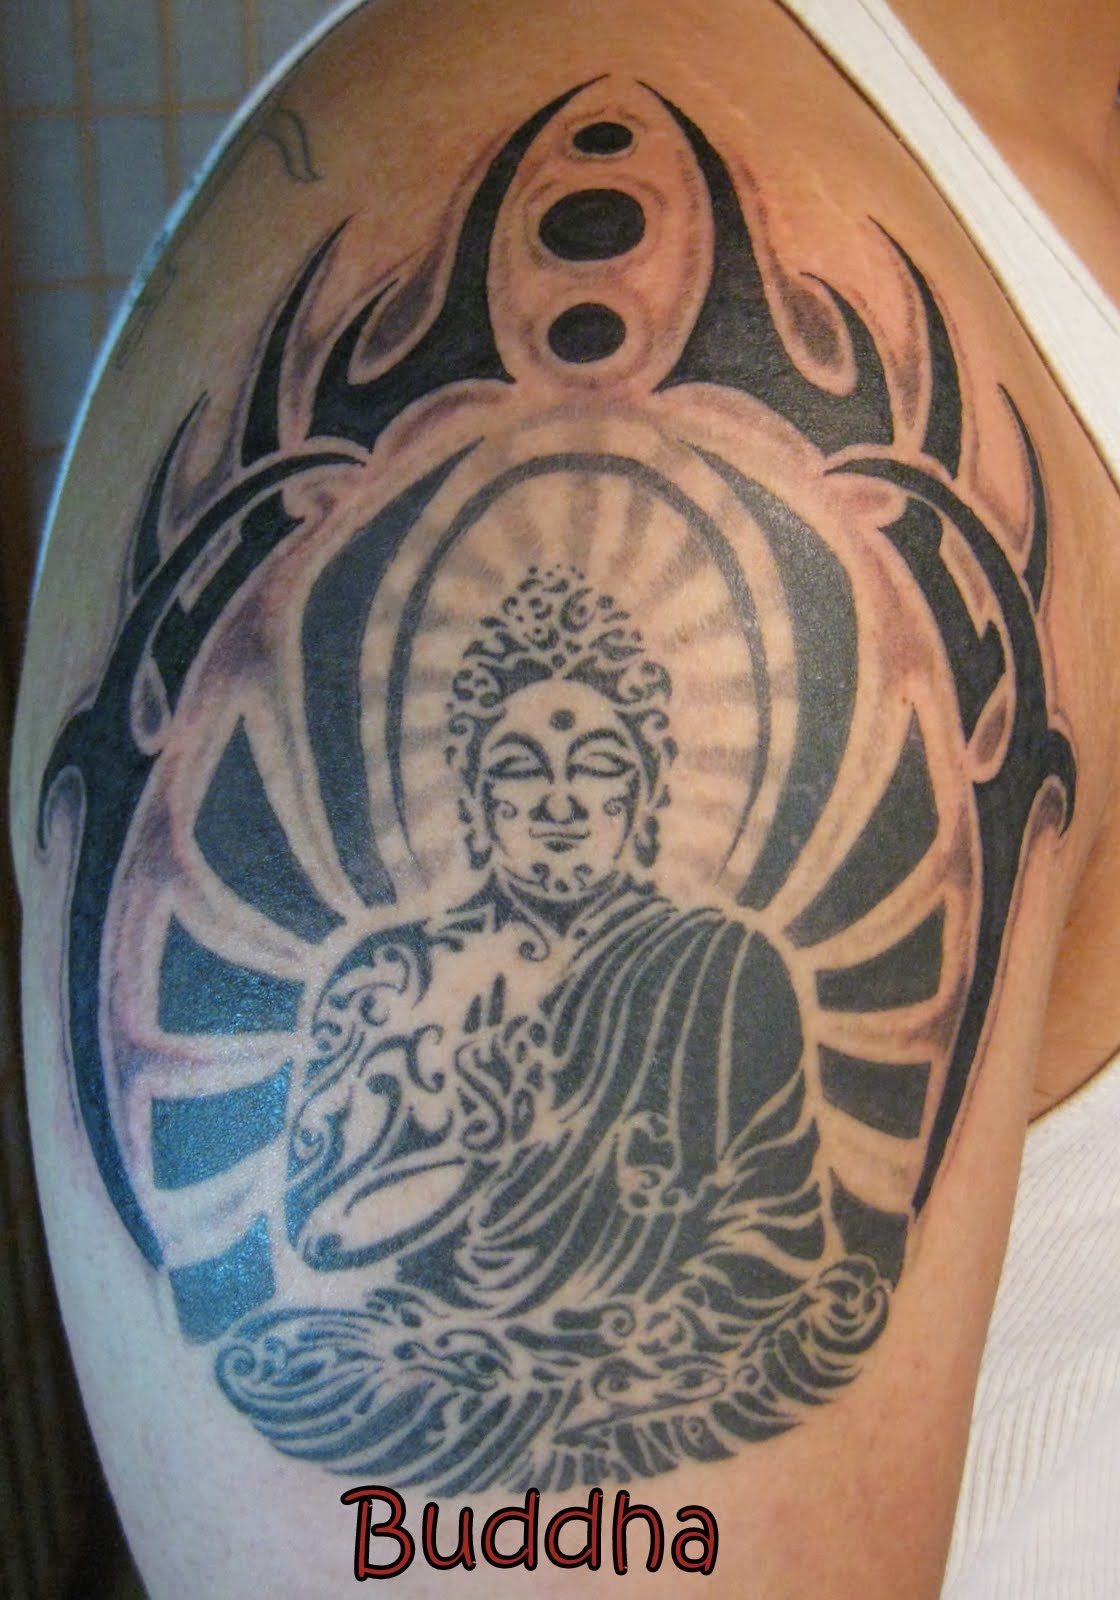 Tattoos Designs Collection Gallery Buddhist Tattoos Ideas